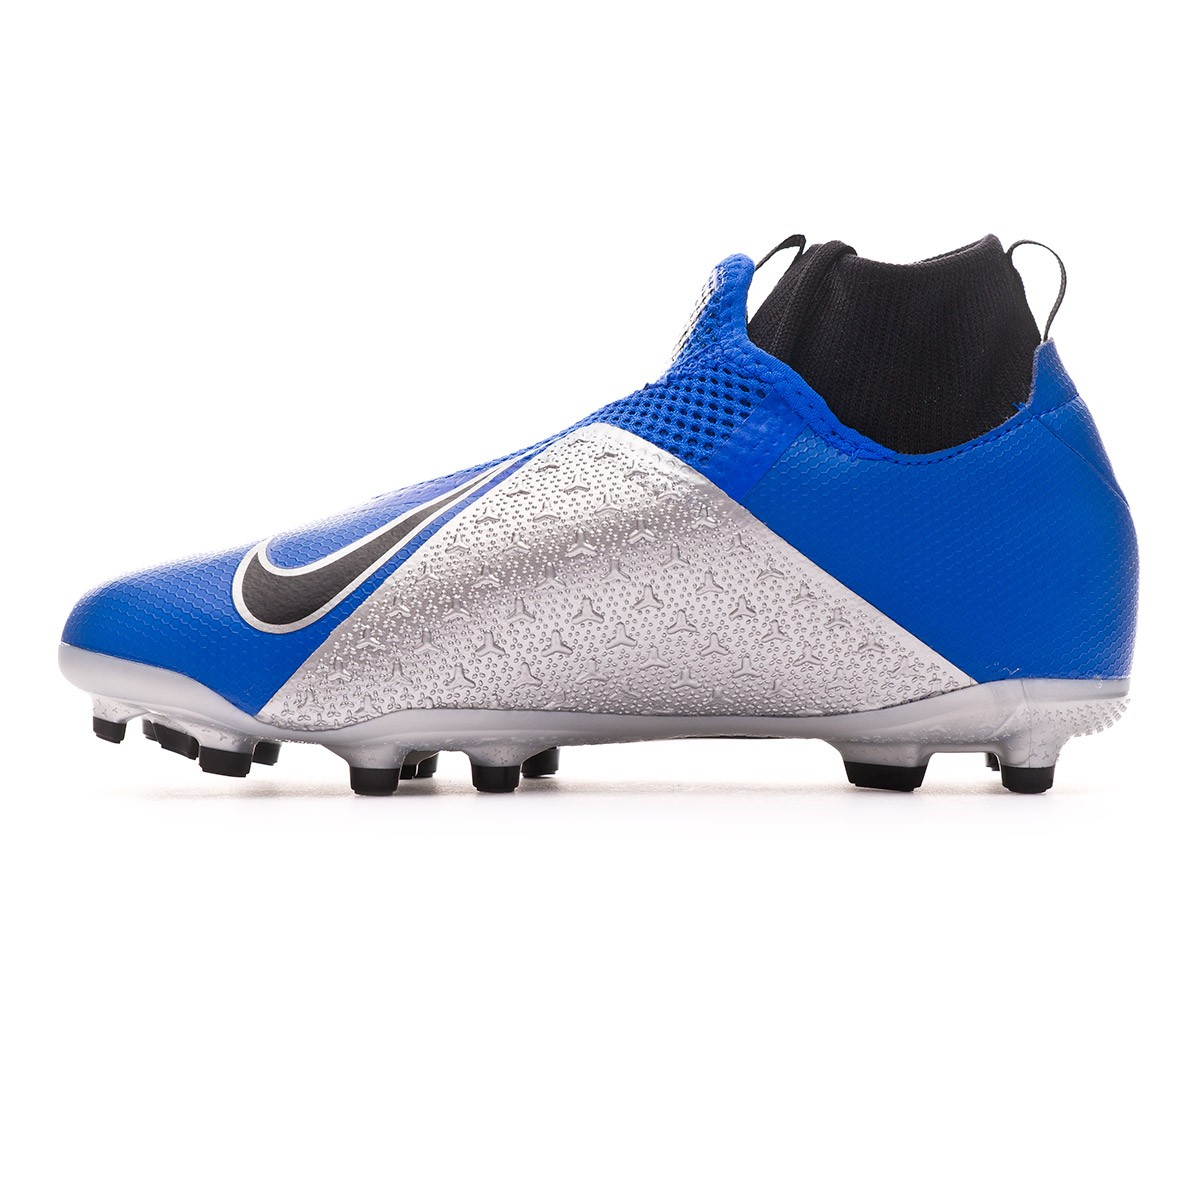 ca18b6b3609 Bota de fútbol Nike Phantom Vision Academy DF FG/MG Niño Racer blue-Black -  Tienda de fútbol Fútbol Emotion